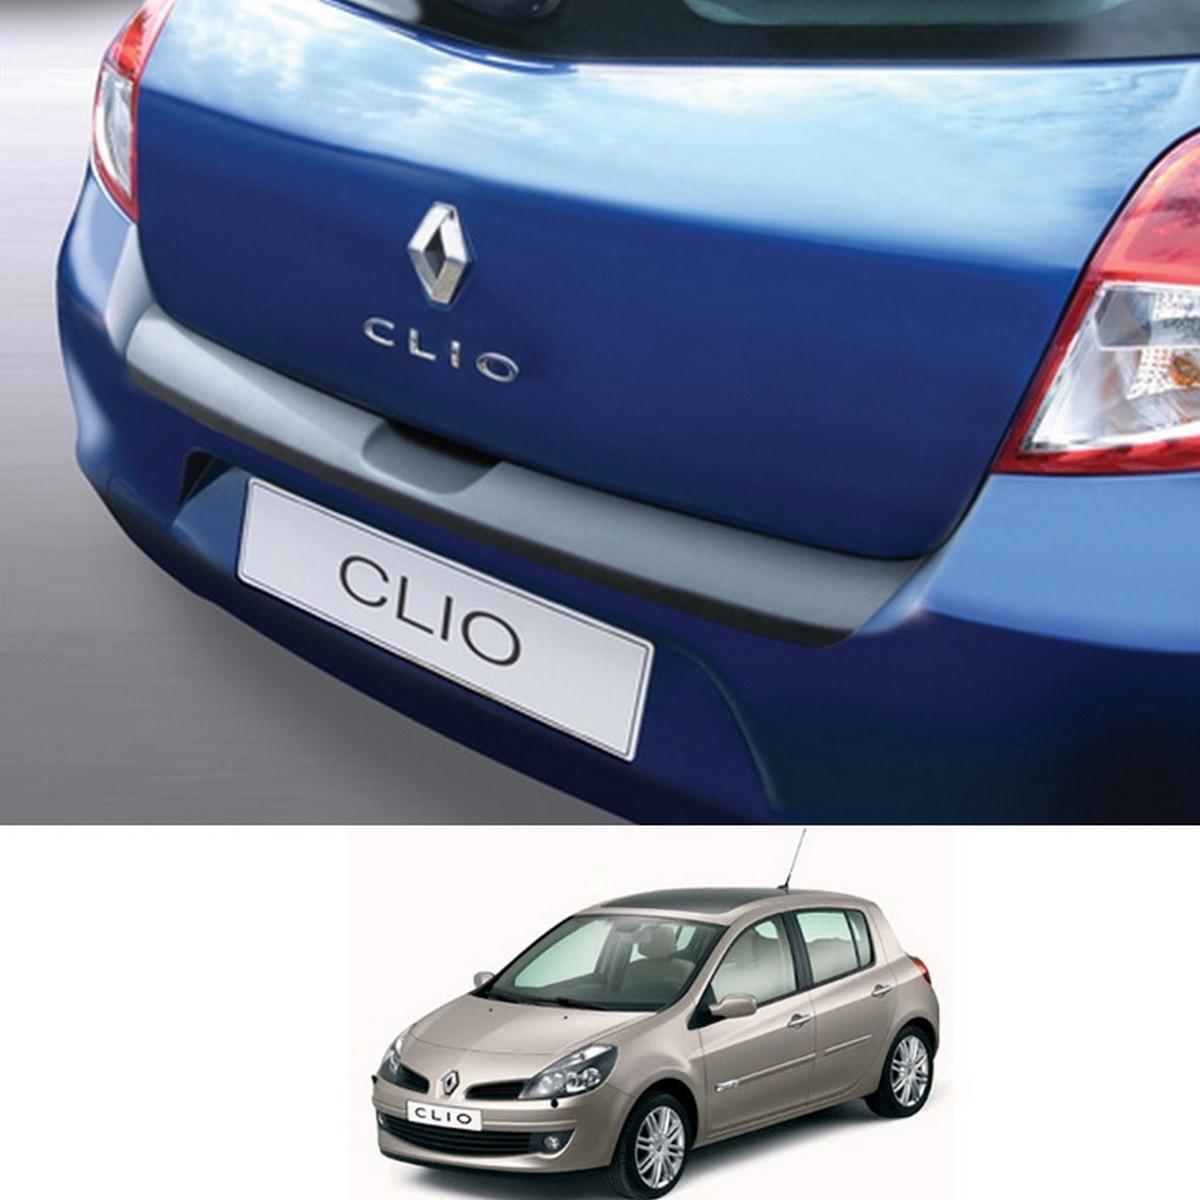 Пластикова захисна накладка на задній бампер для Renault Clio III 3/5 door 2009-2014